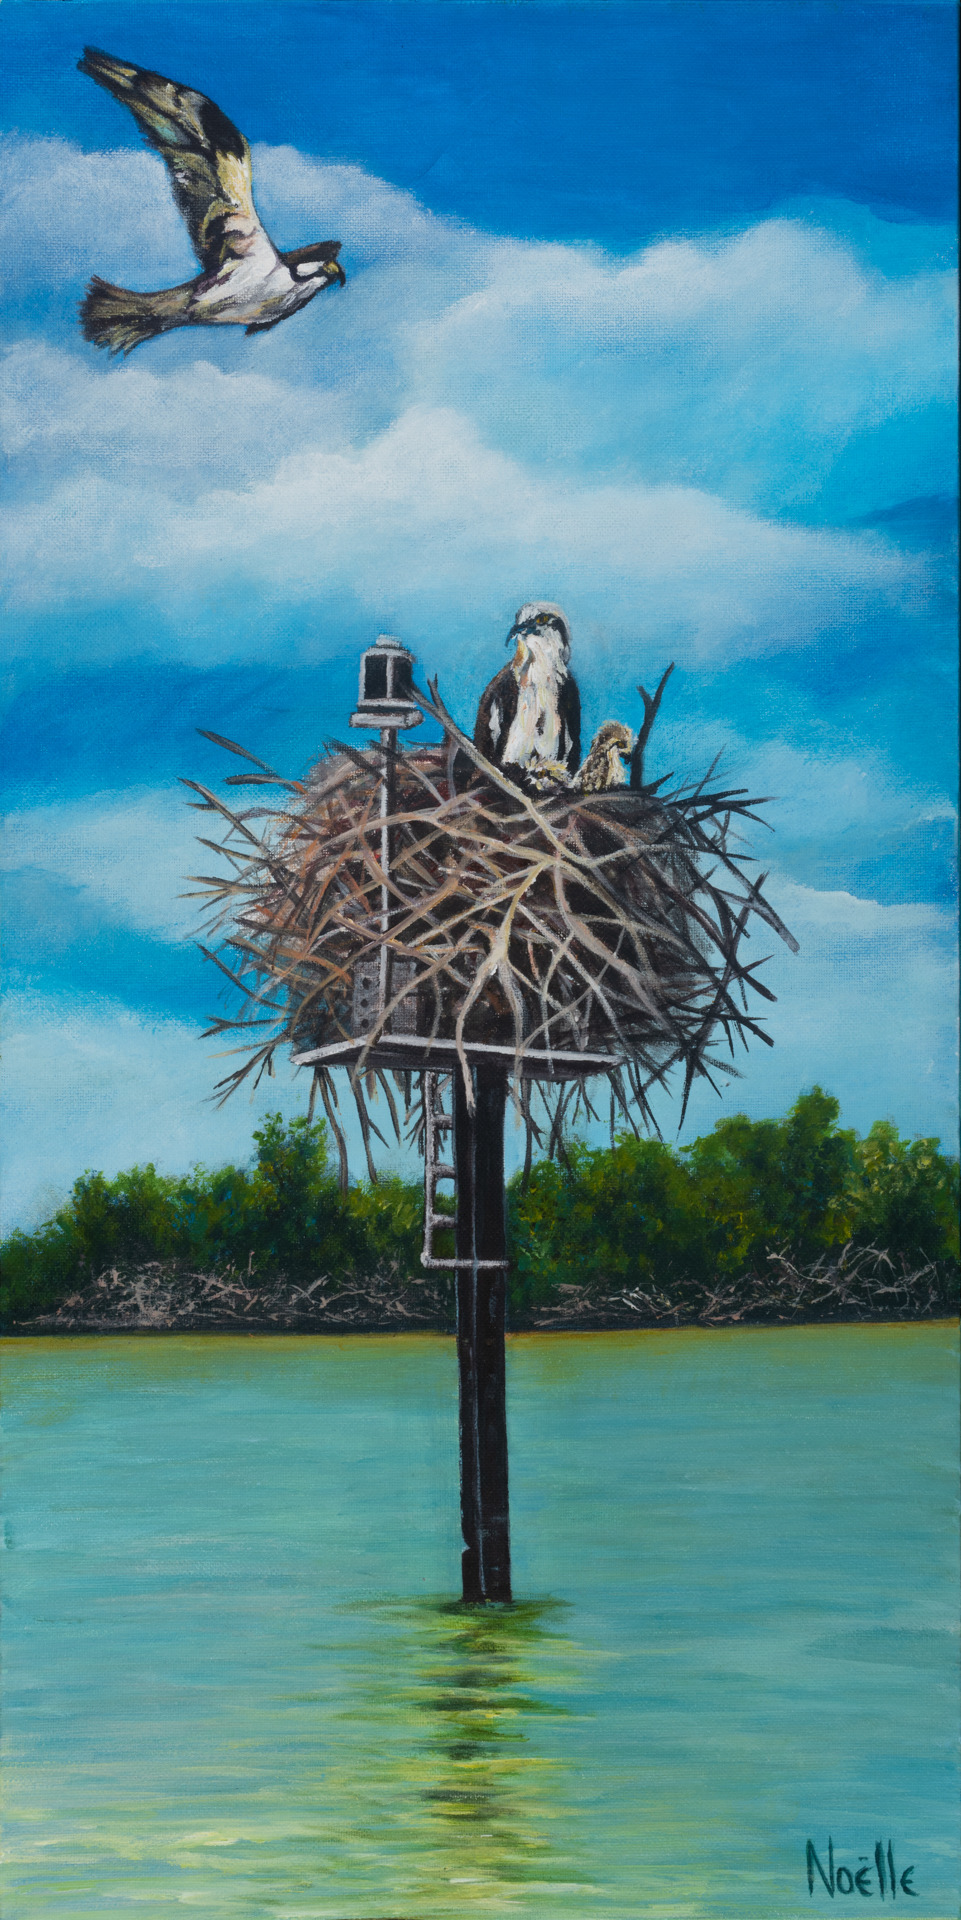 Noelle mccarthy home sweet osprey acrylic 12x24 475.00 wicit9